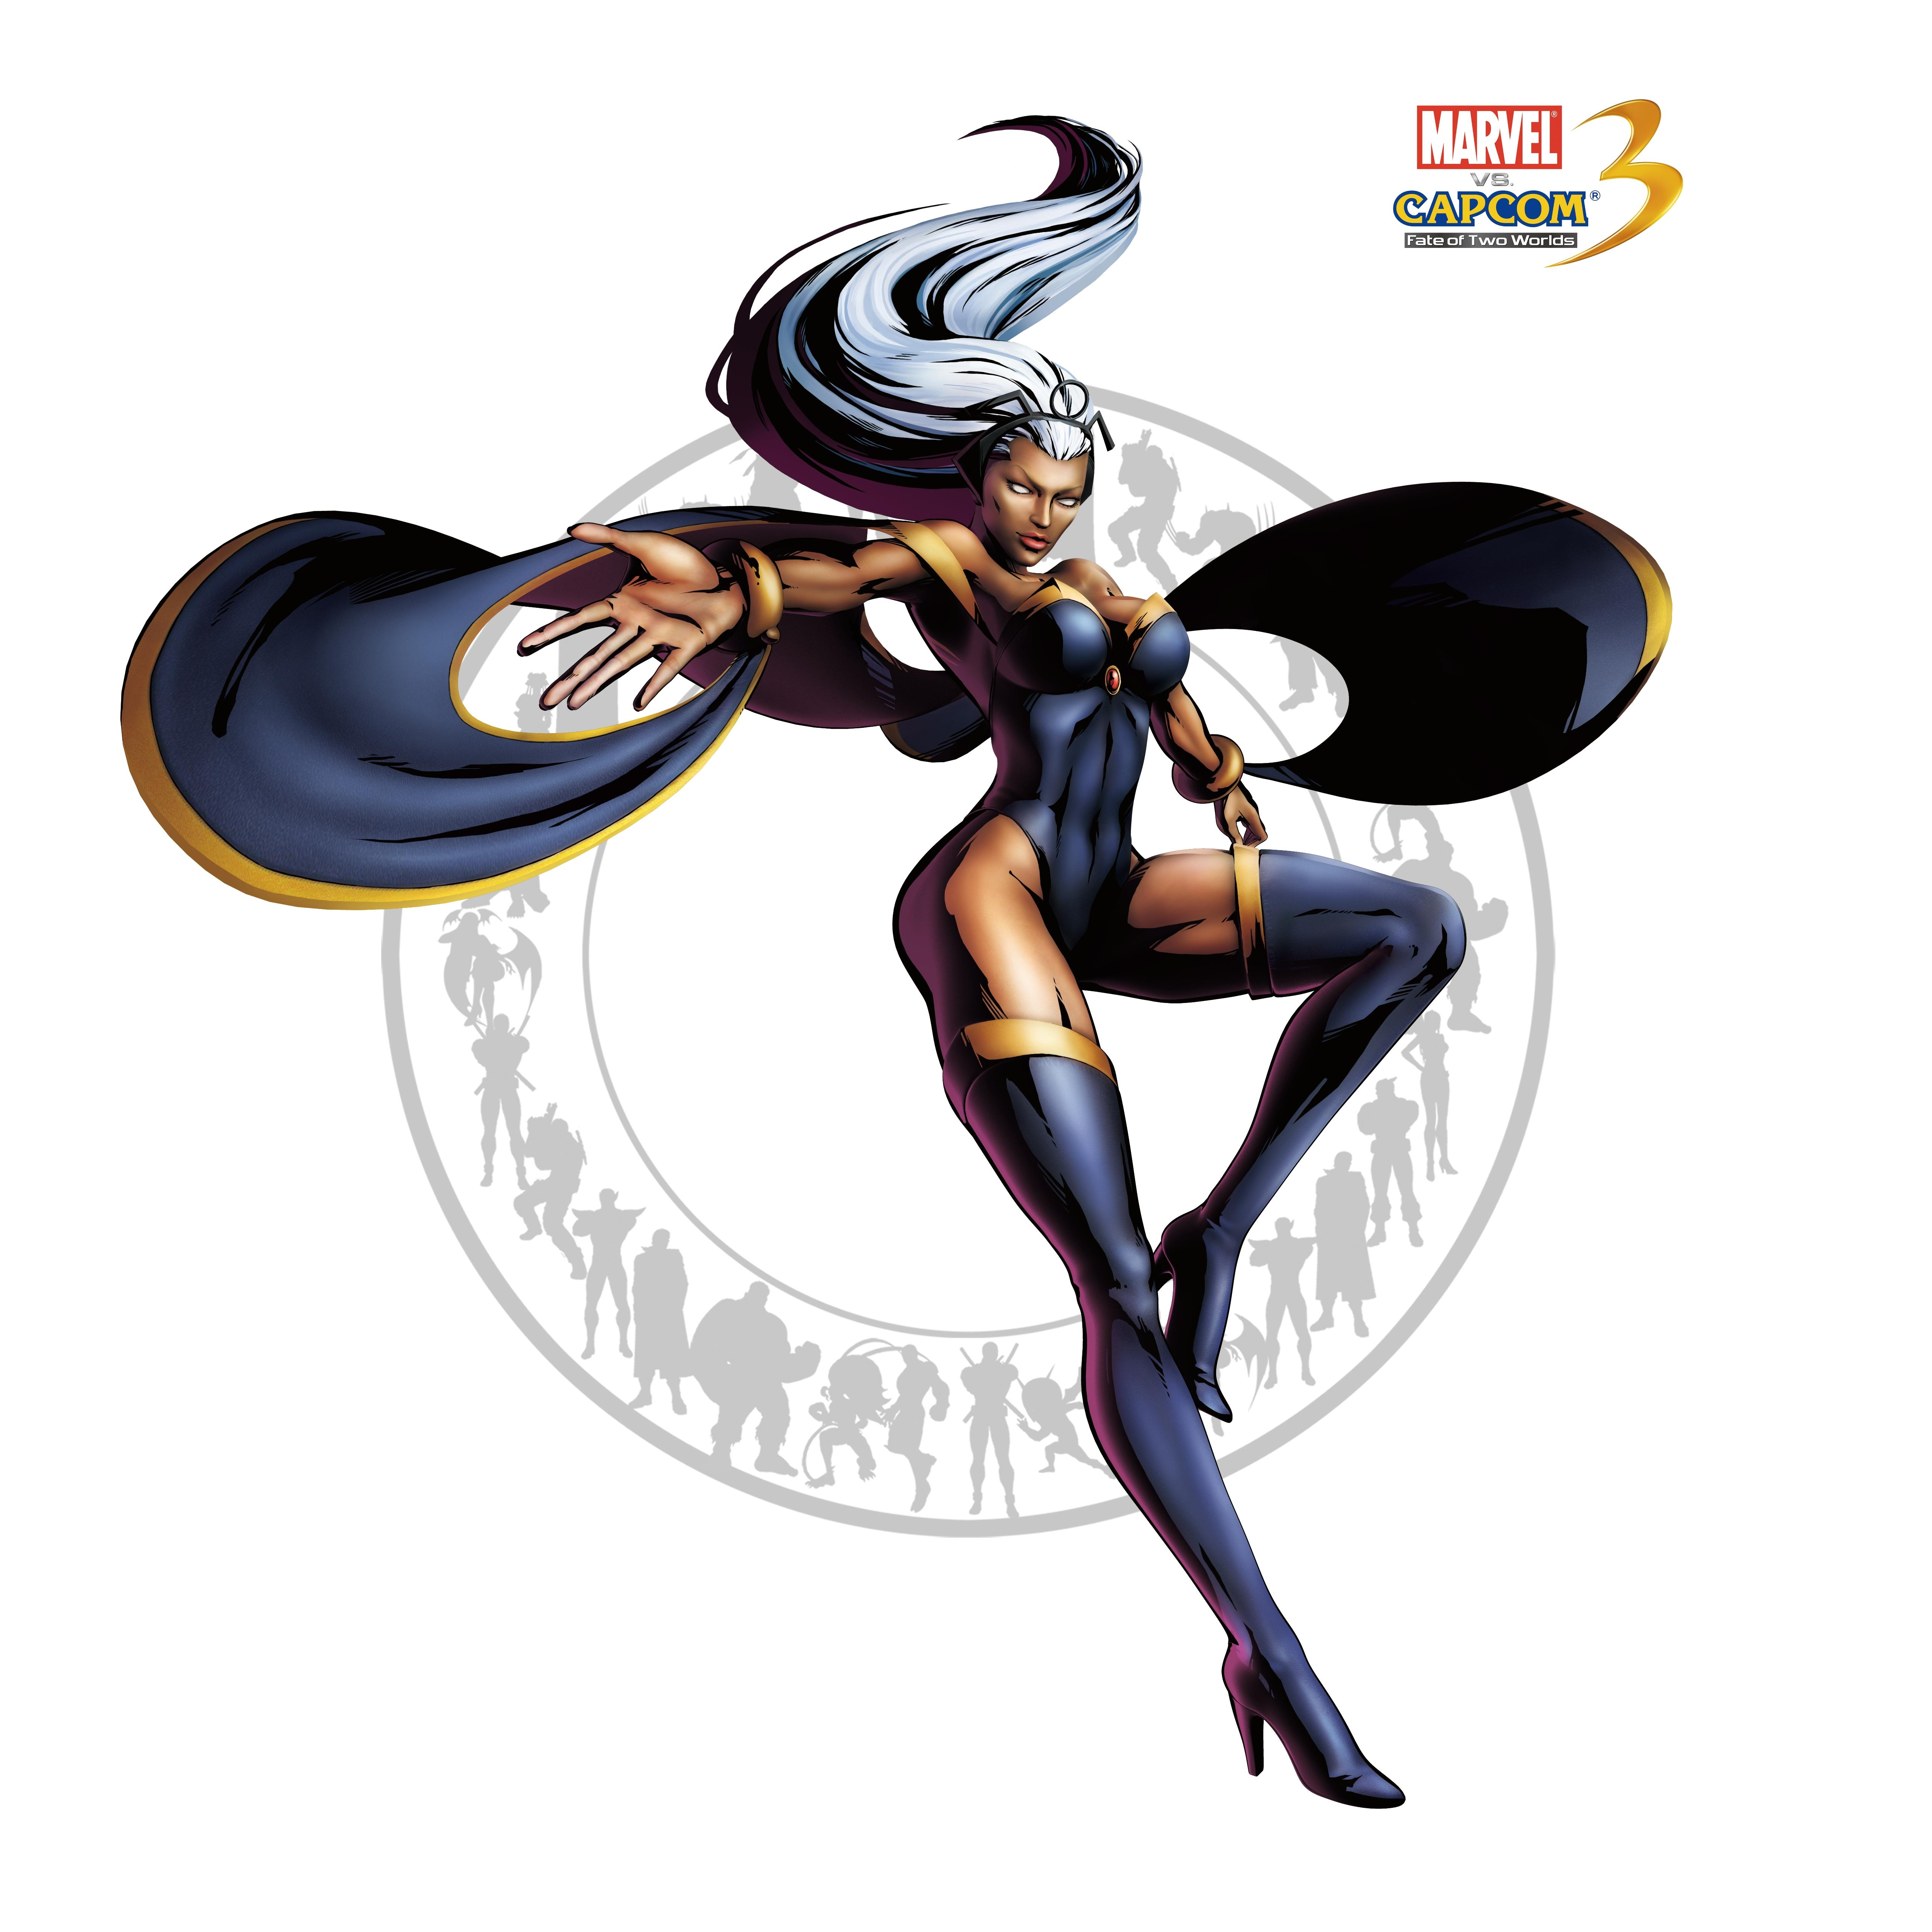 Шторм - Marvel vs. Capcom 3: Fate of Two Worlds Арт, Персонаж